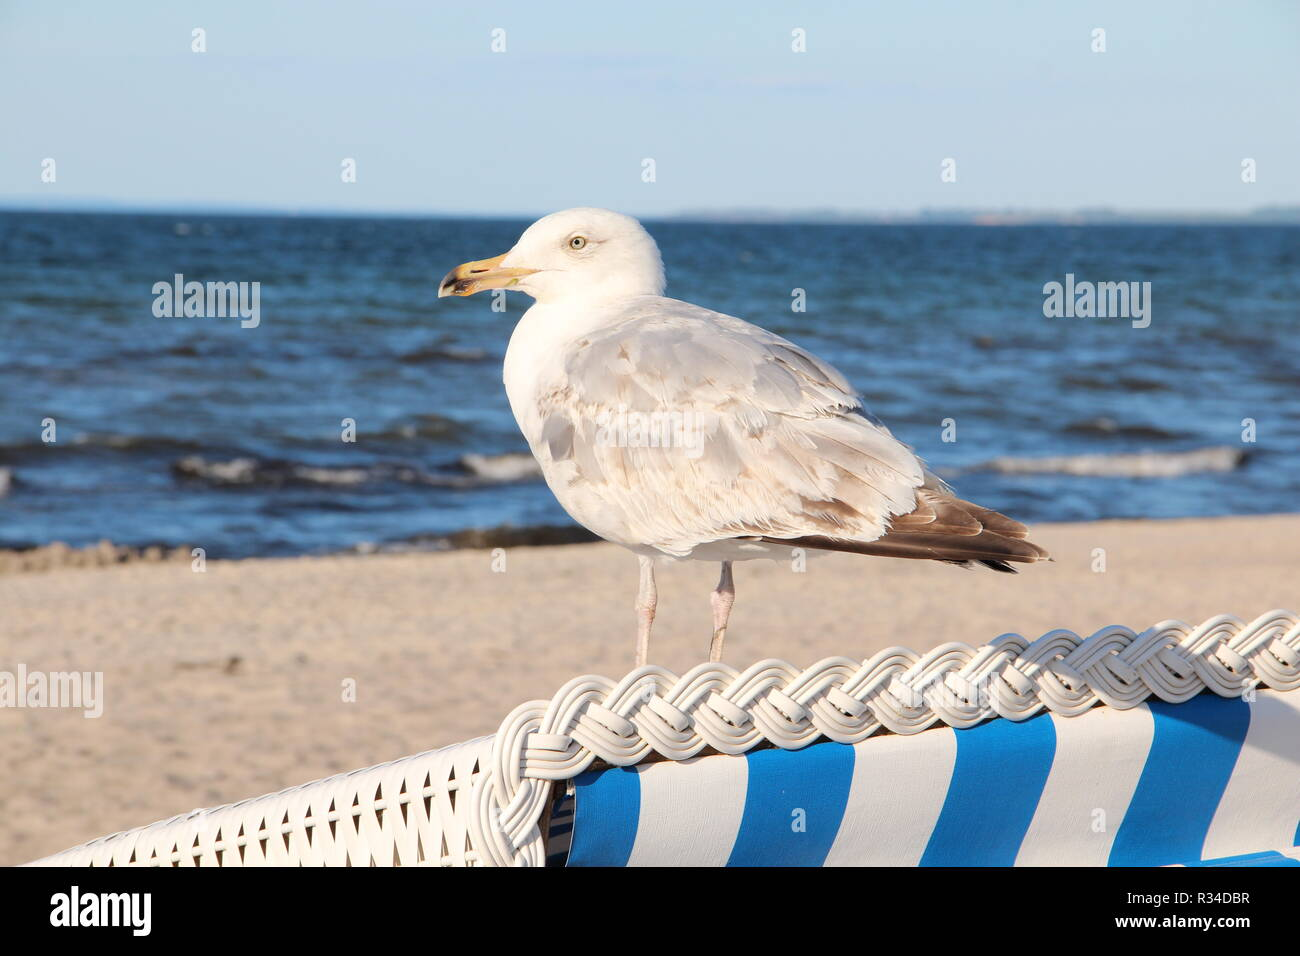 on the baltic sea beach - Stock Image